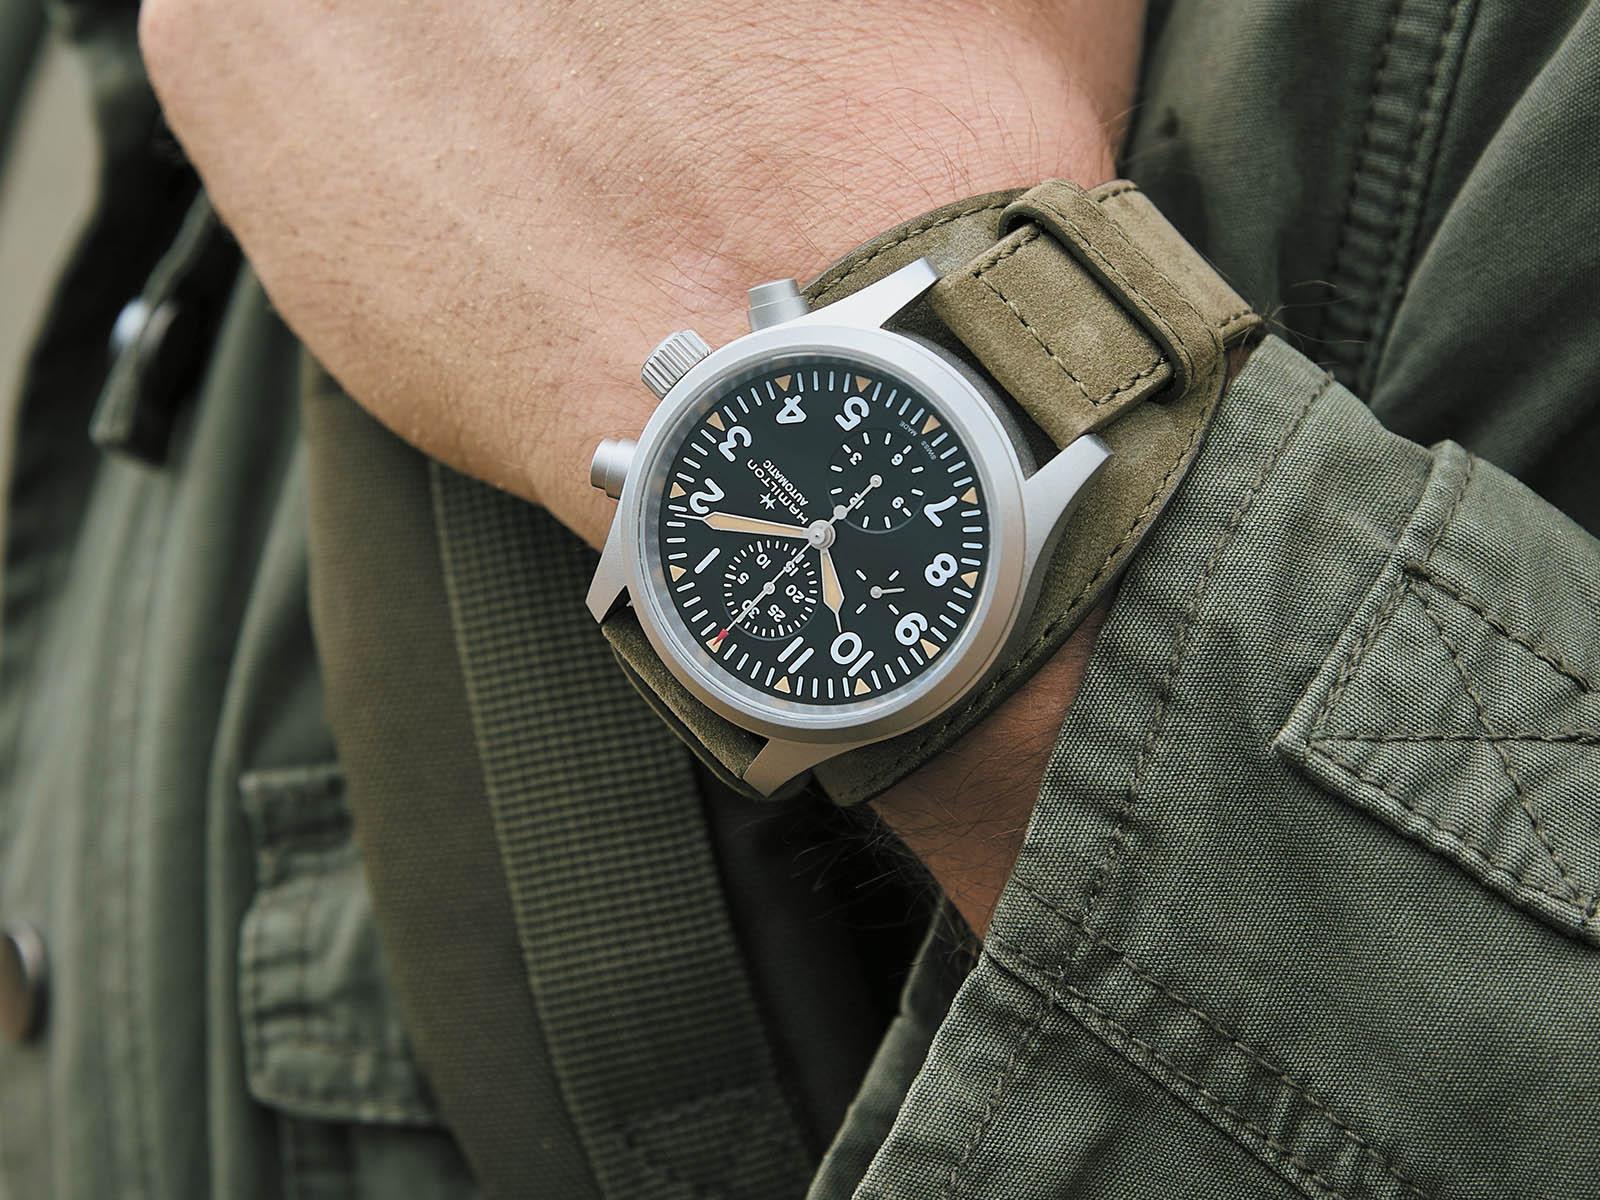 h71706830-hamilton-khaki-field-automatic-chronograph-2.jpg